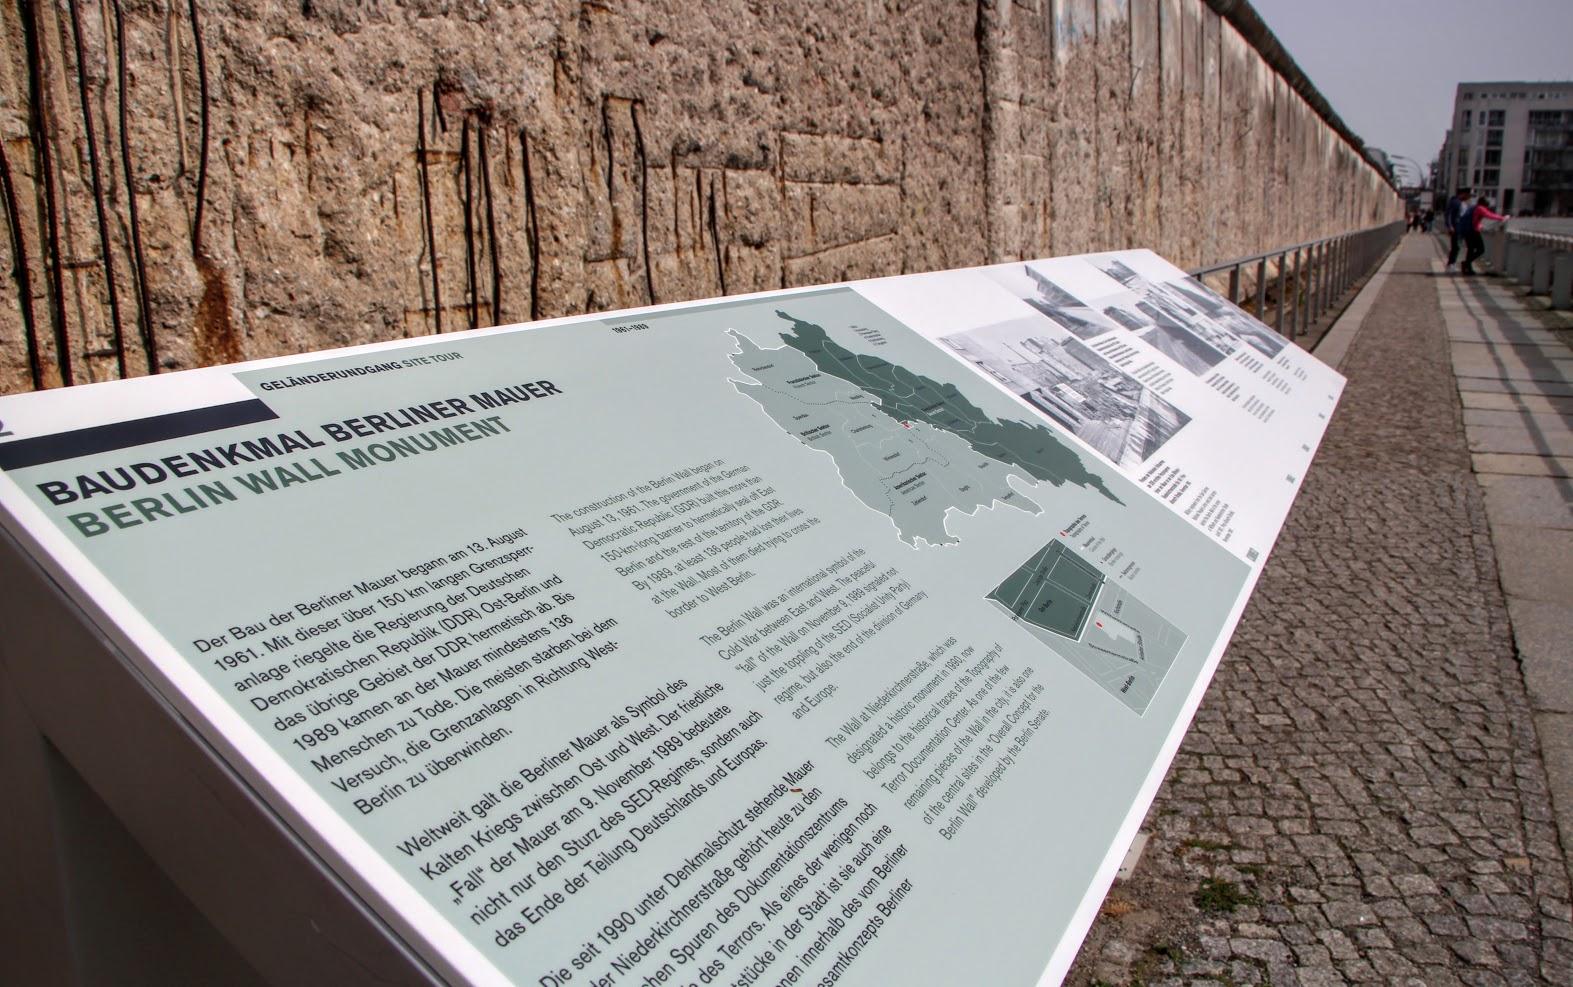 Berlin History 12